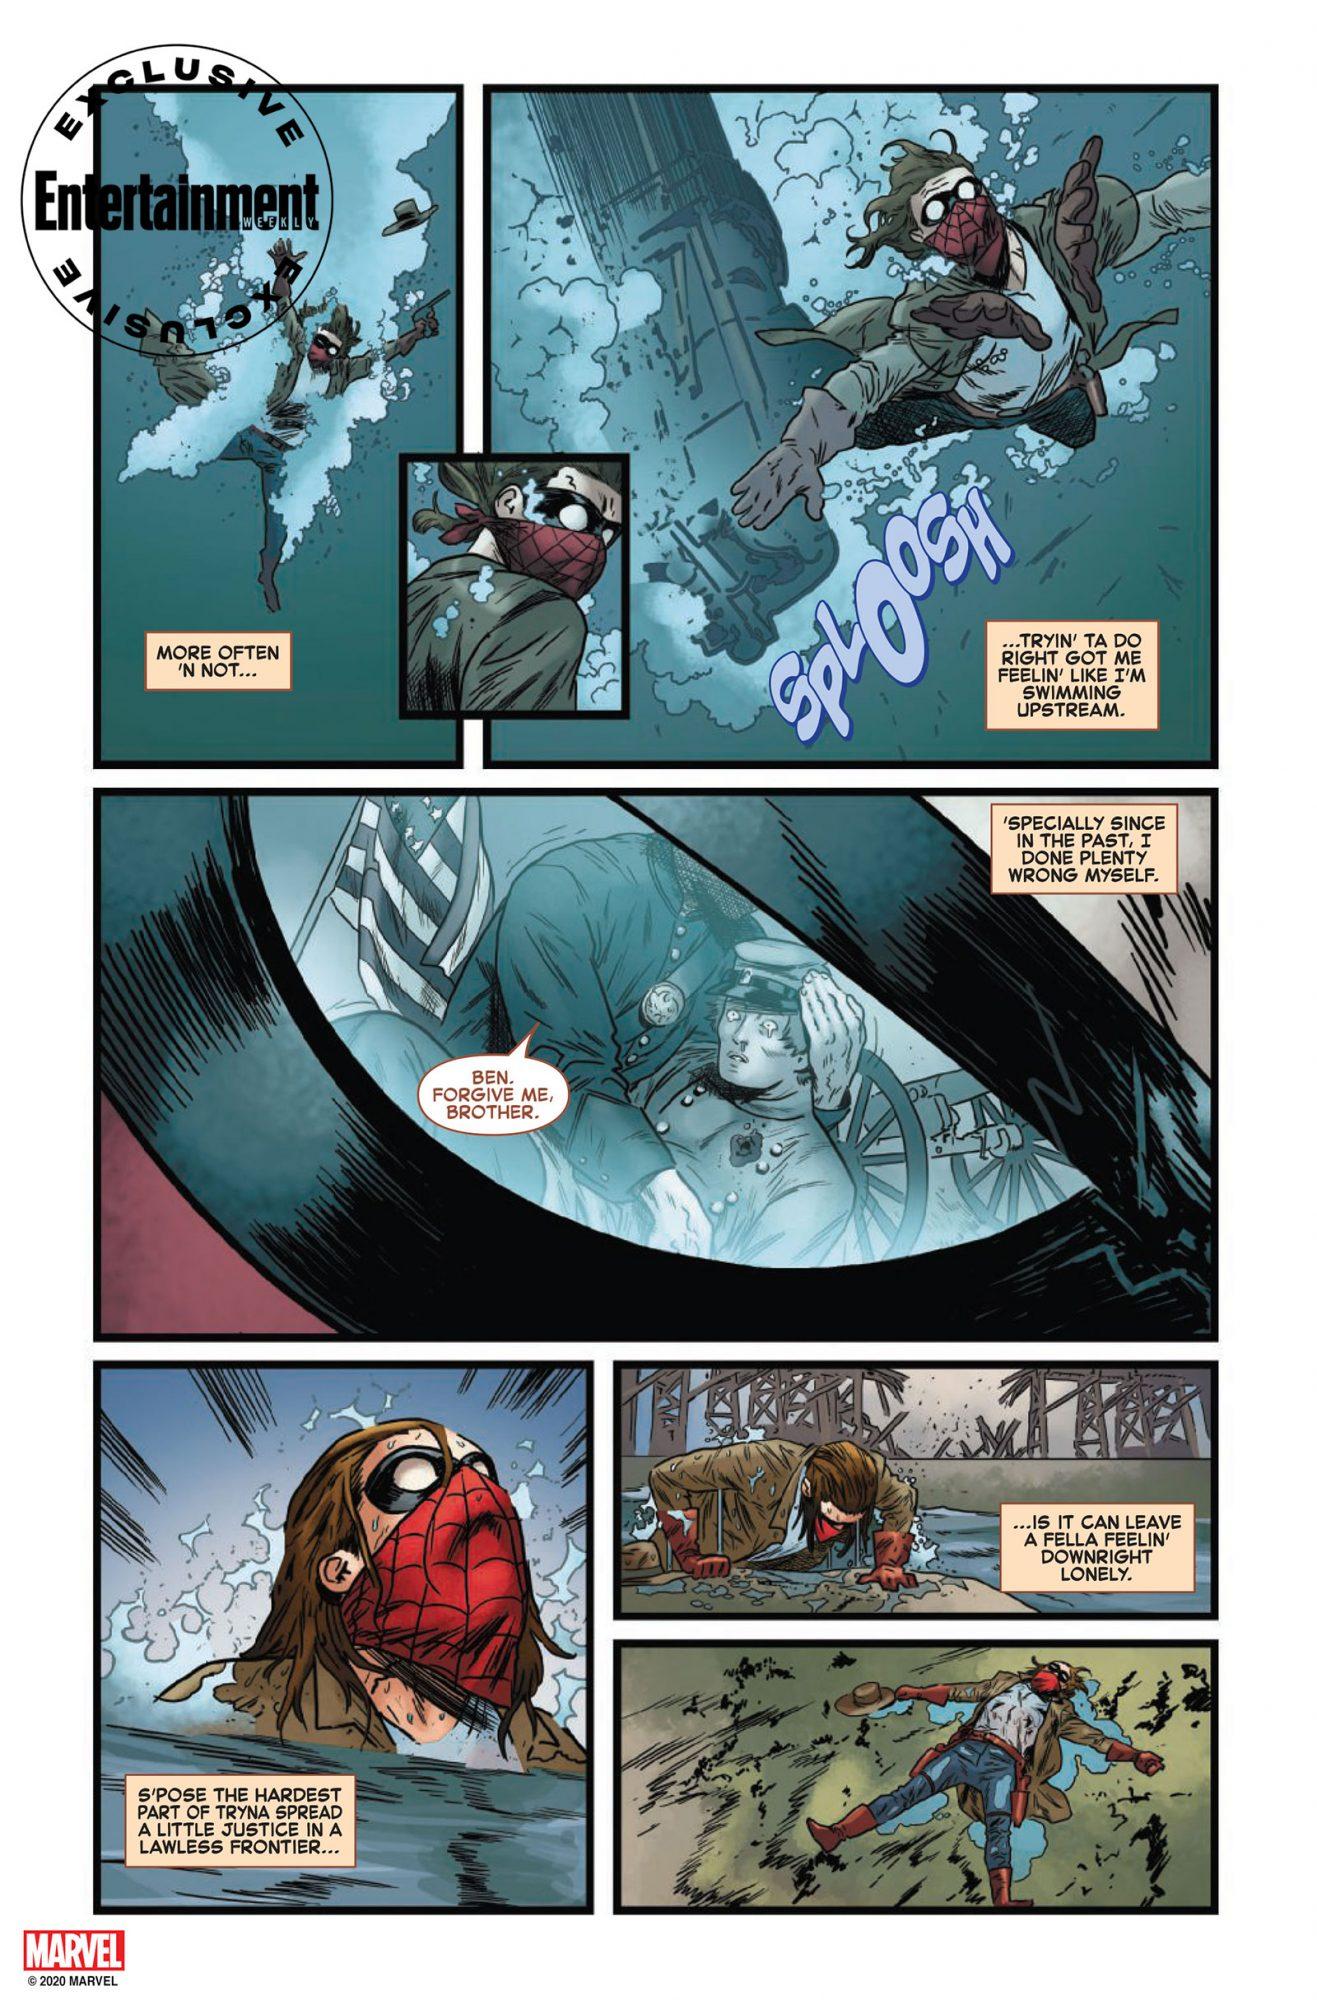 Spider-Verse (2019-) #4 (of 6) by Taran Killam